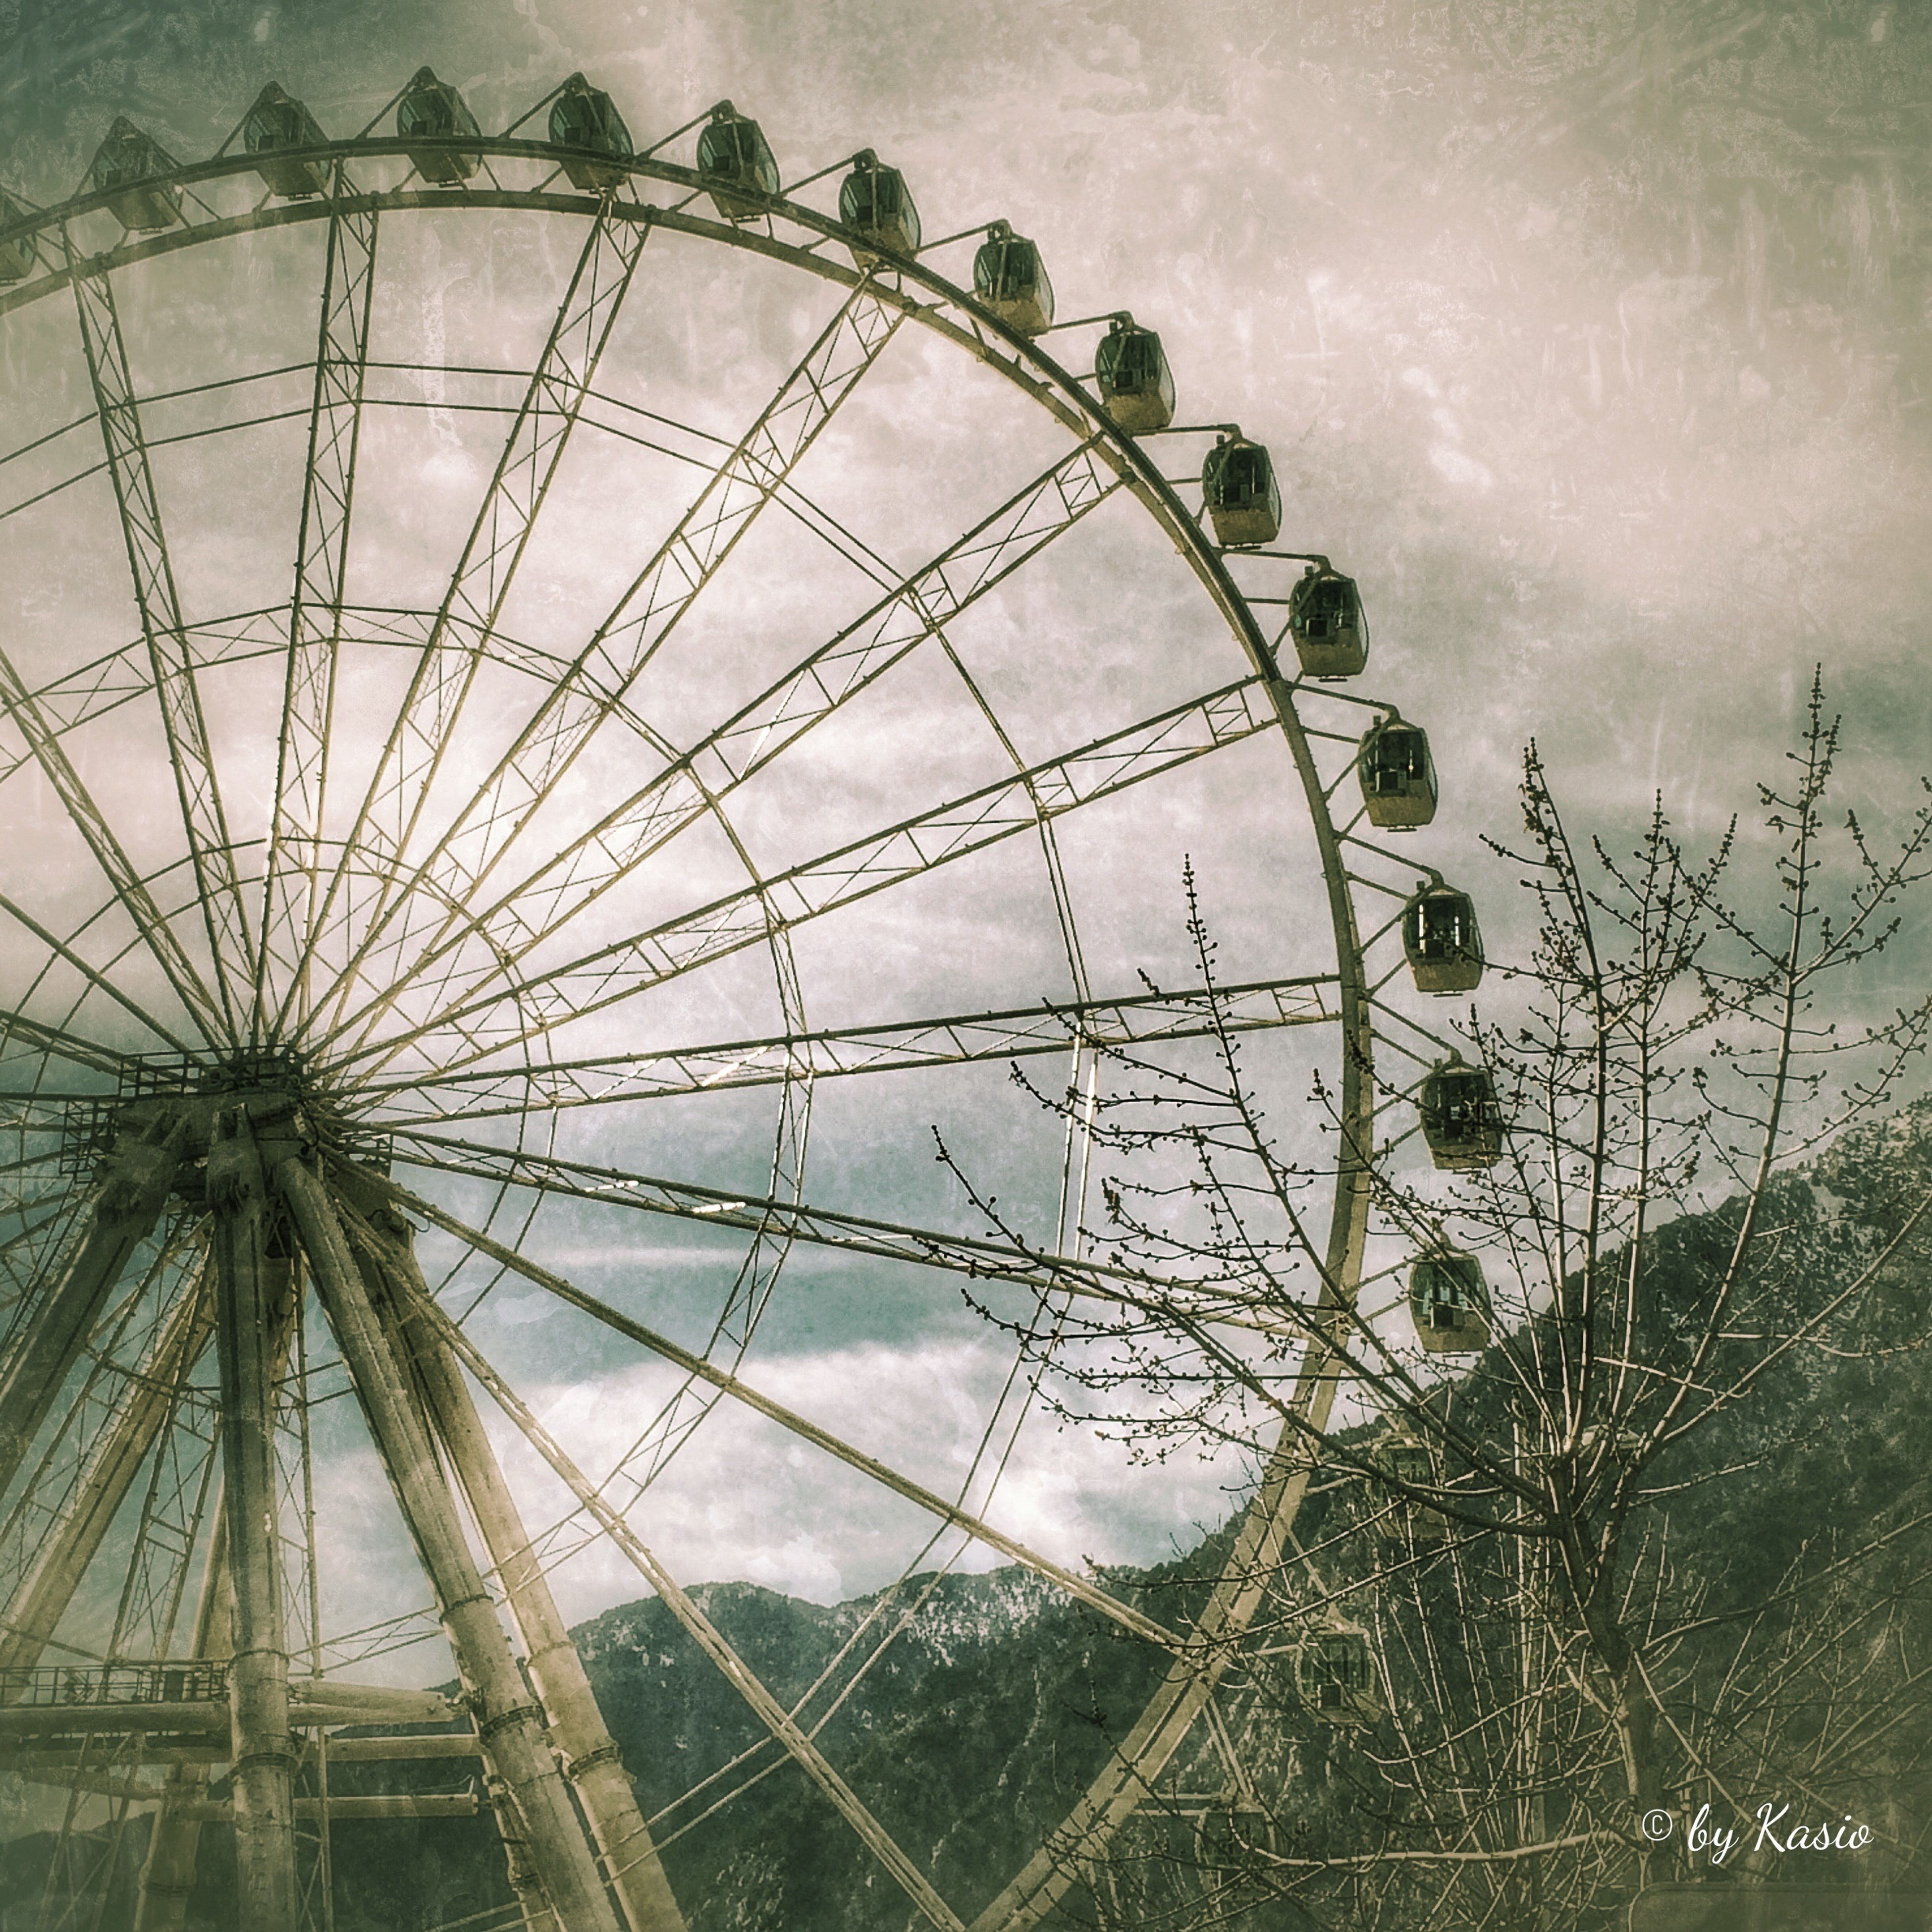 ferris wheel, amusement park, amusement park ride, low angle view, sky, arts culture and entertainment, cloud - sky, built structure, day, outdoors, circle, cloudy, cloud, architecture, no people, nature, multi colored, metal, pattern, fun